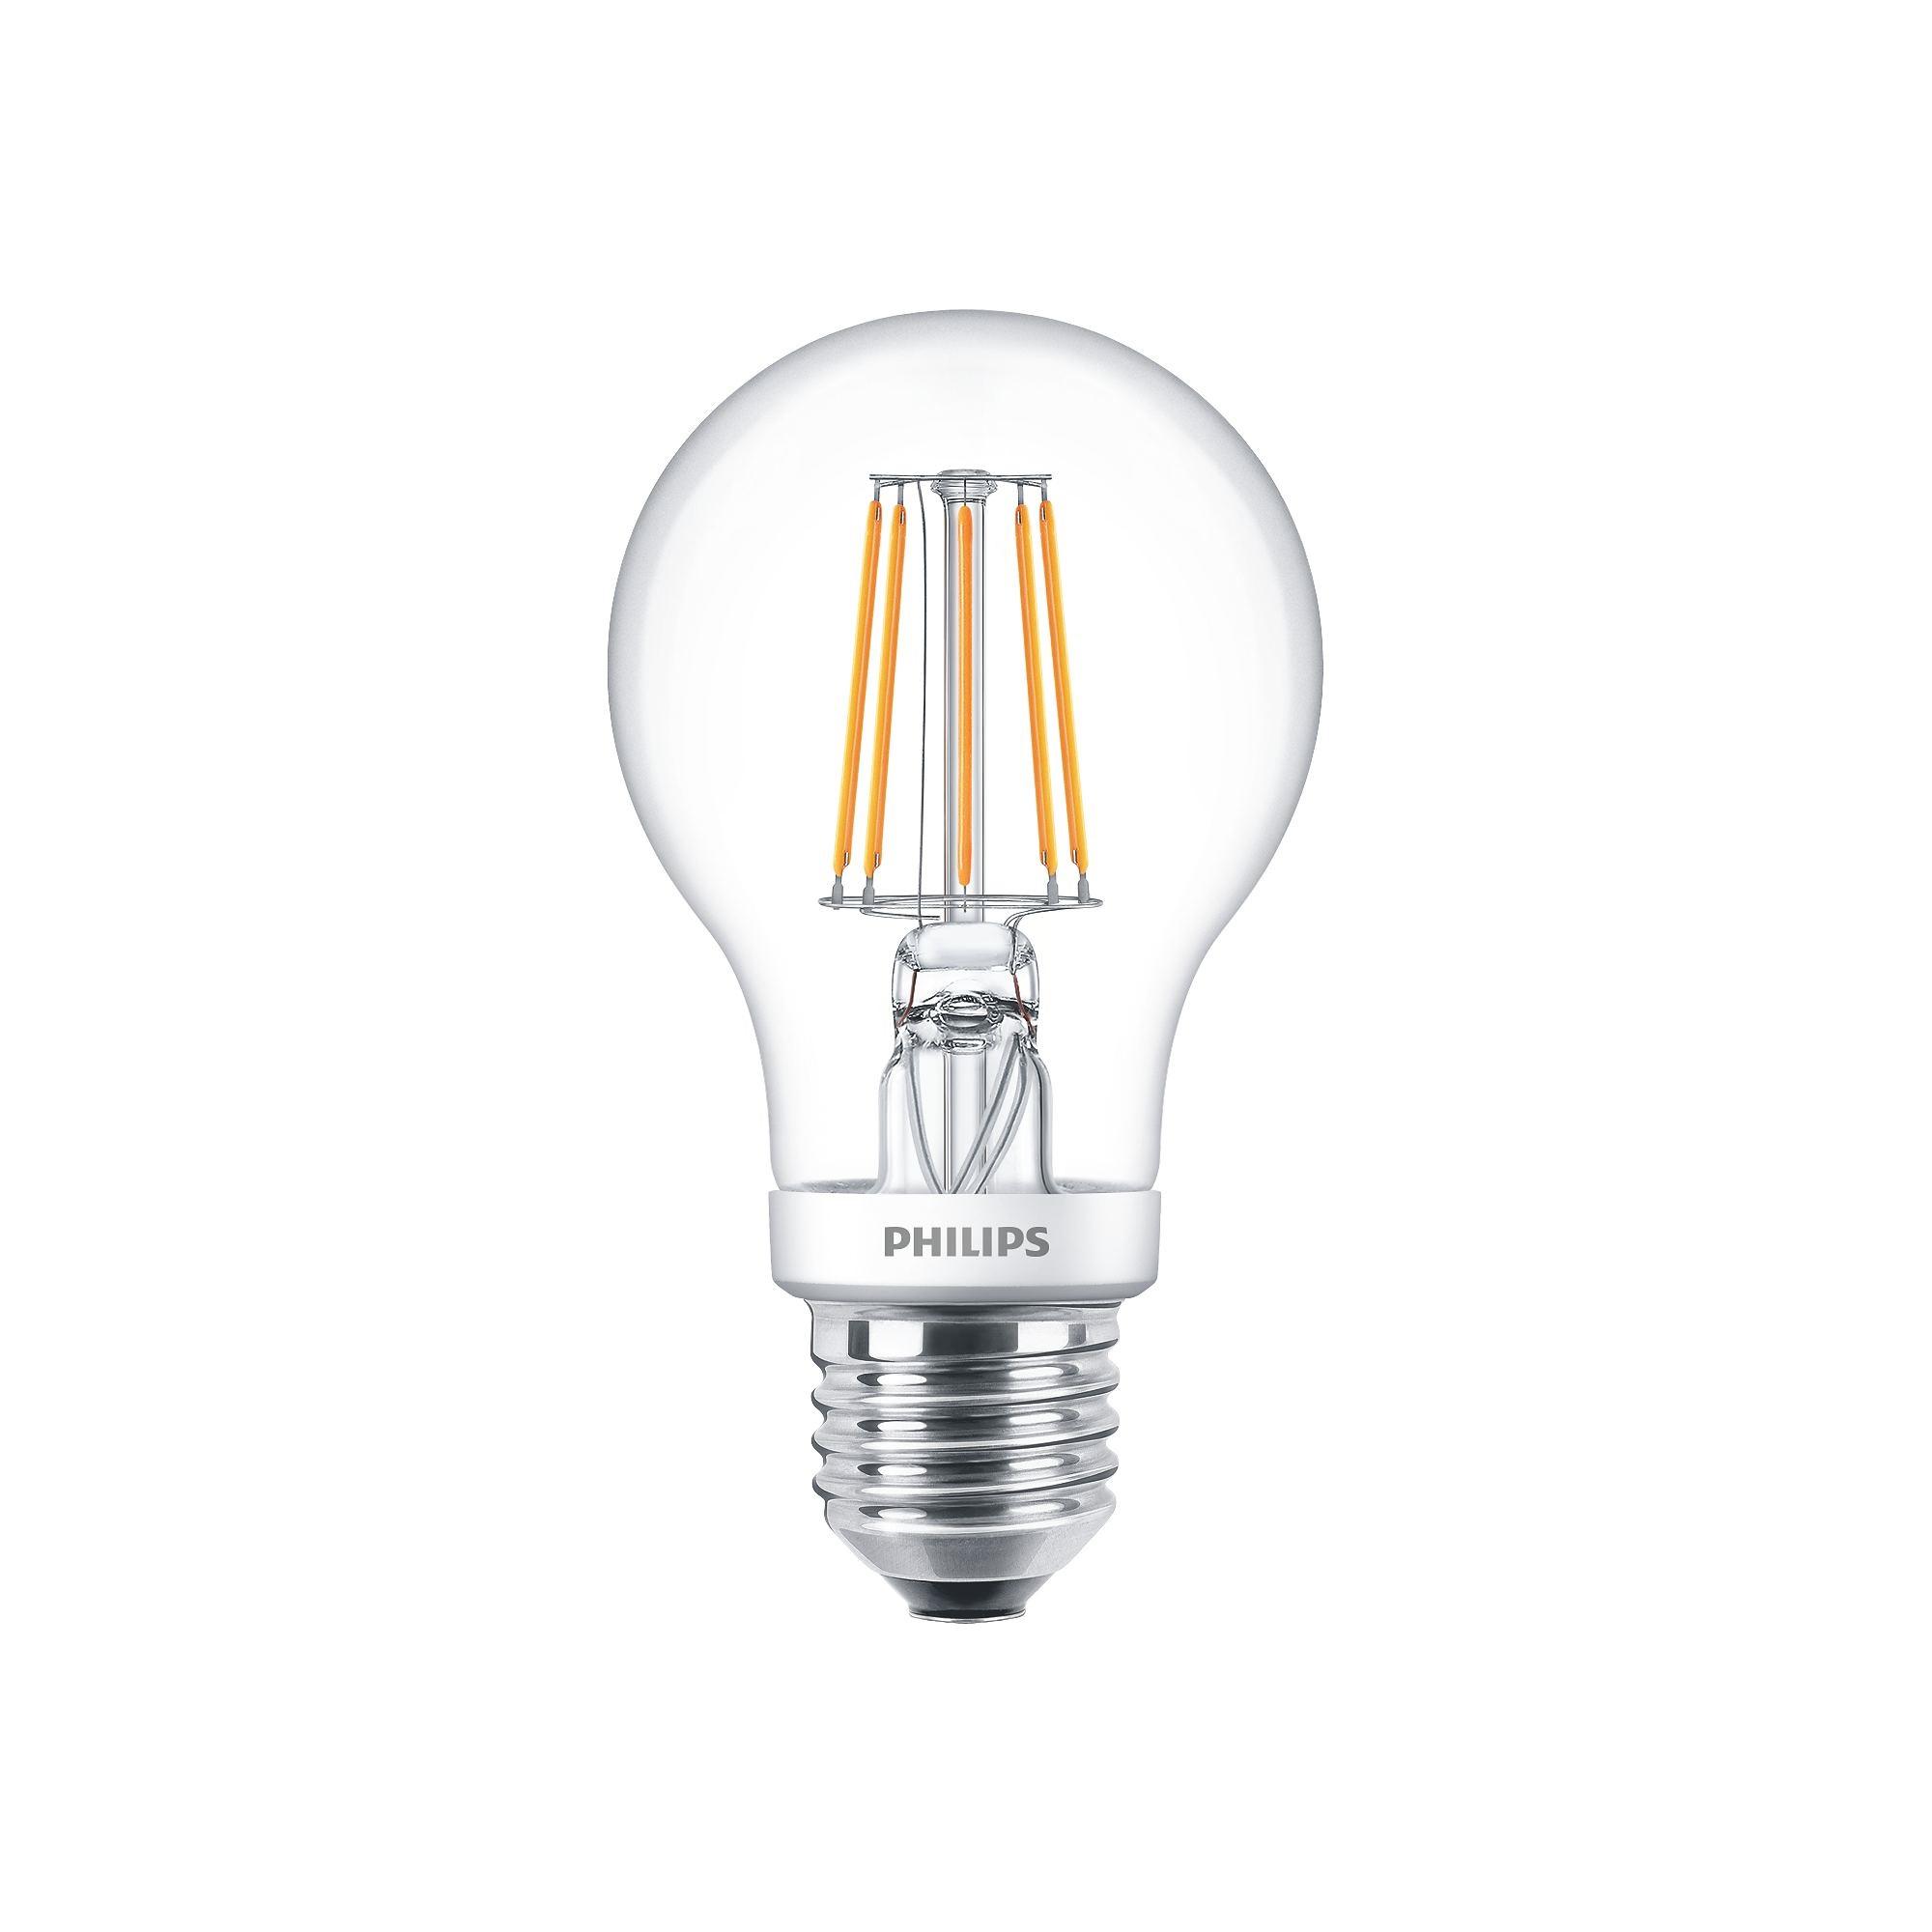 Philips Classic LEDbulb 4,5-40W E27 827 A60 FR